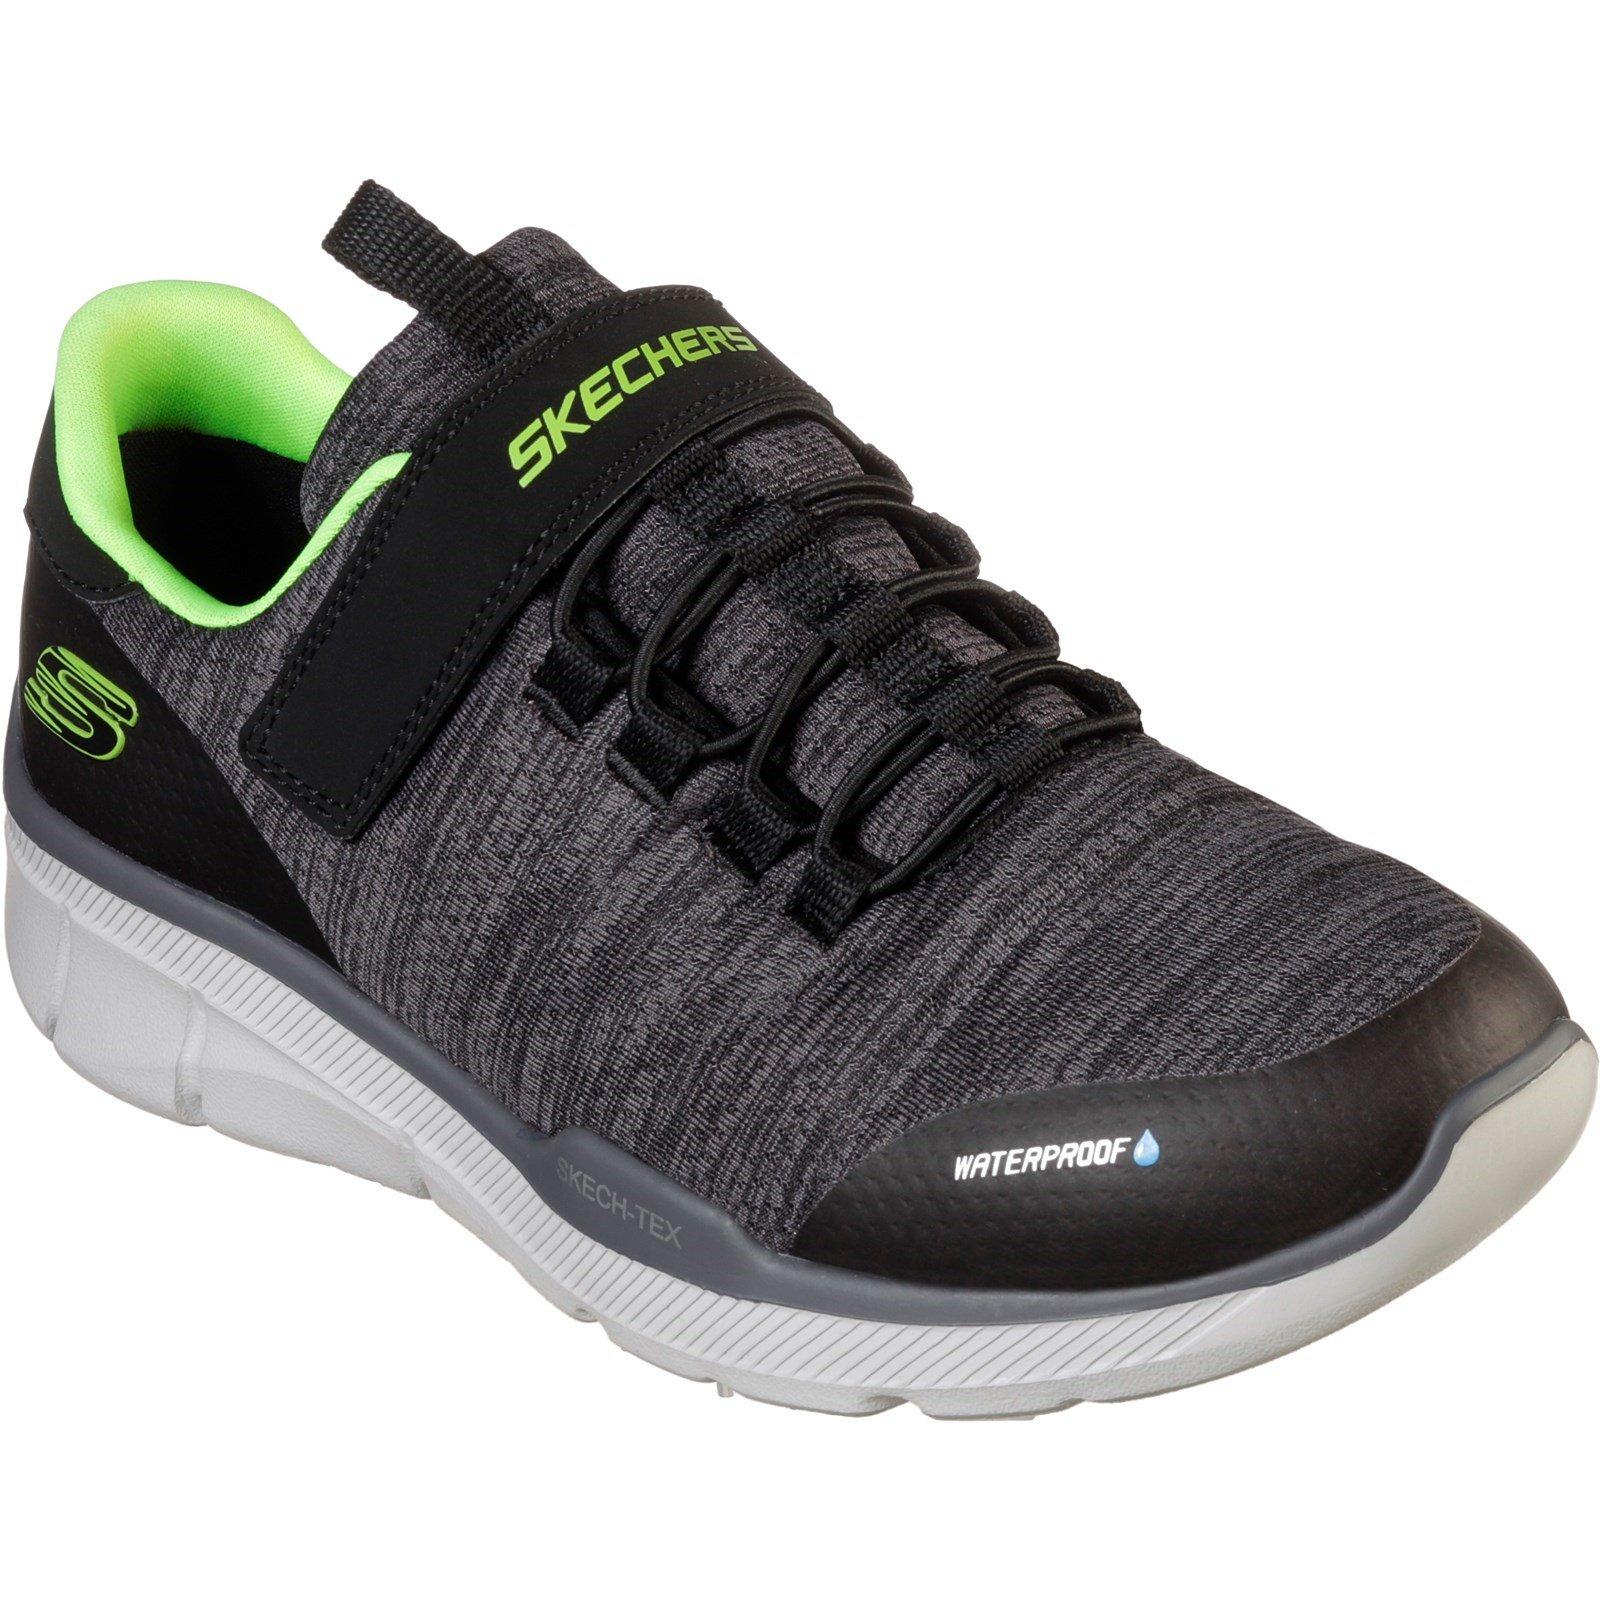 Skechers Unisex Equalizer 3.0 Aquablast Trainer Black 28533 - Black/Charcoal 10.5